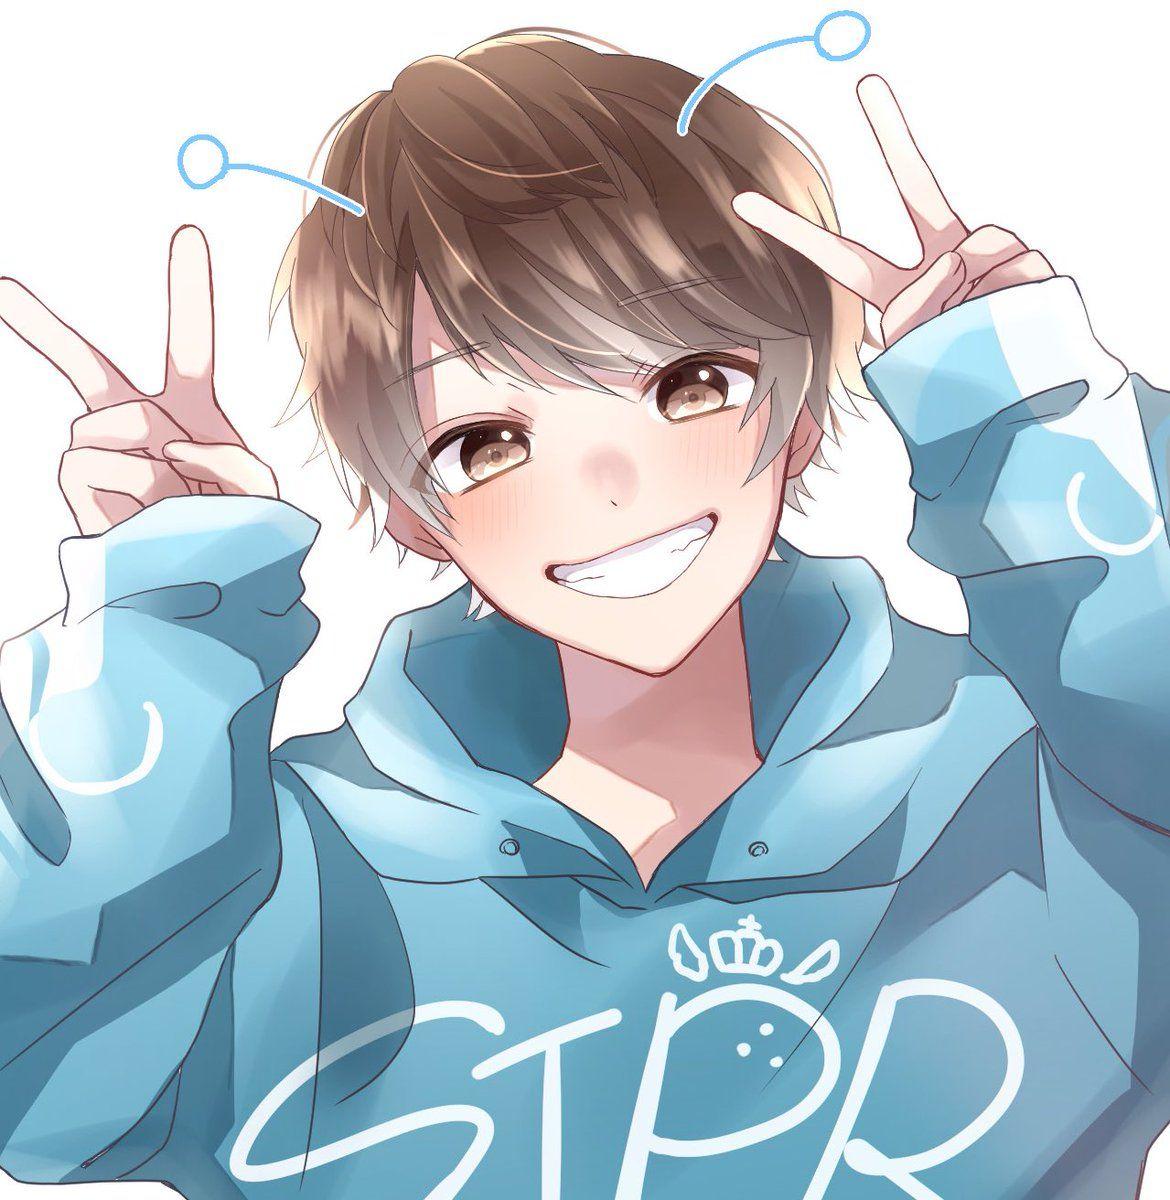 Anime boy wallpaper cute